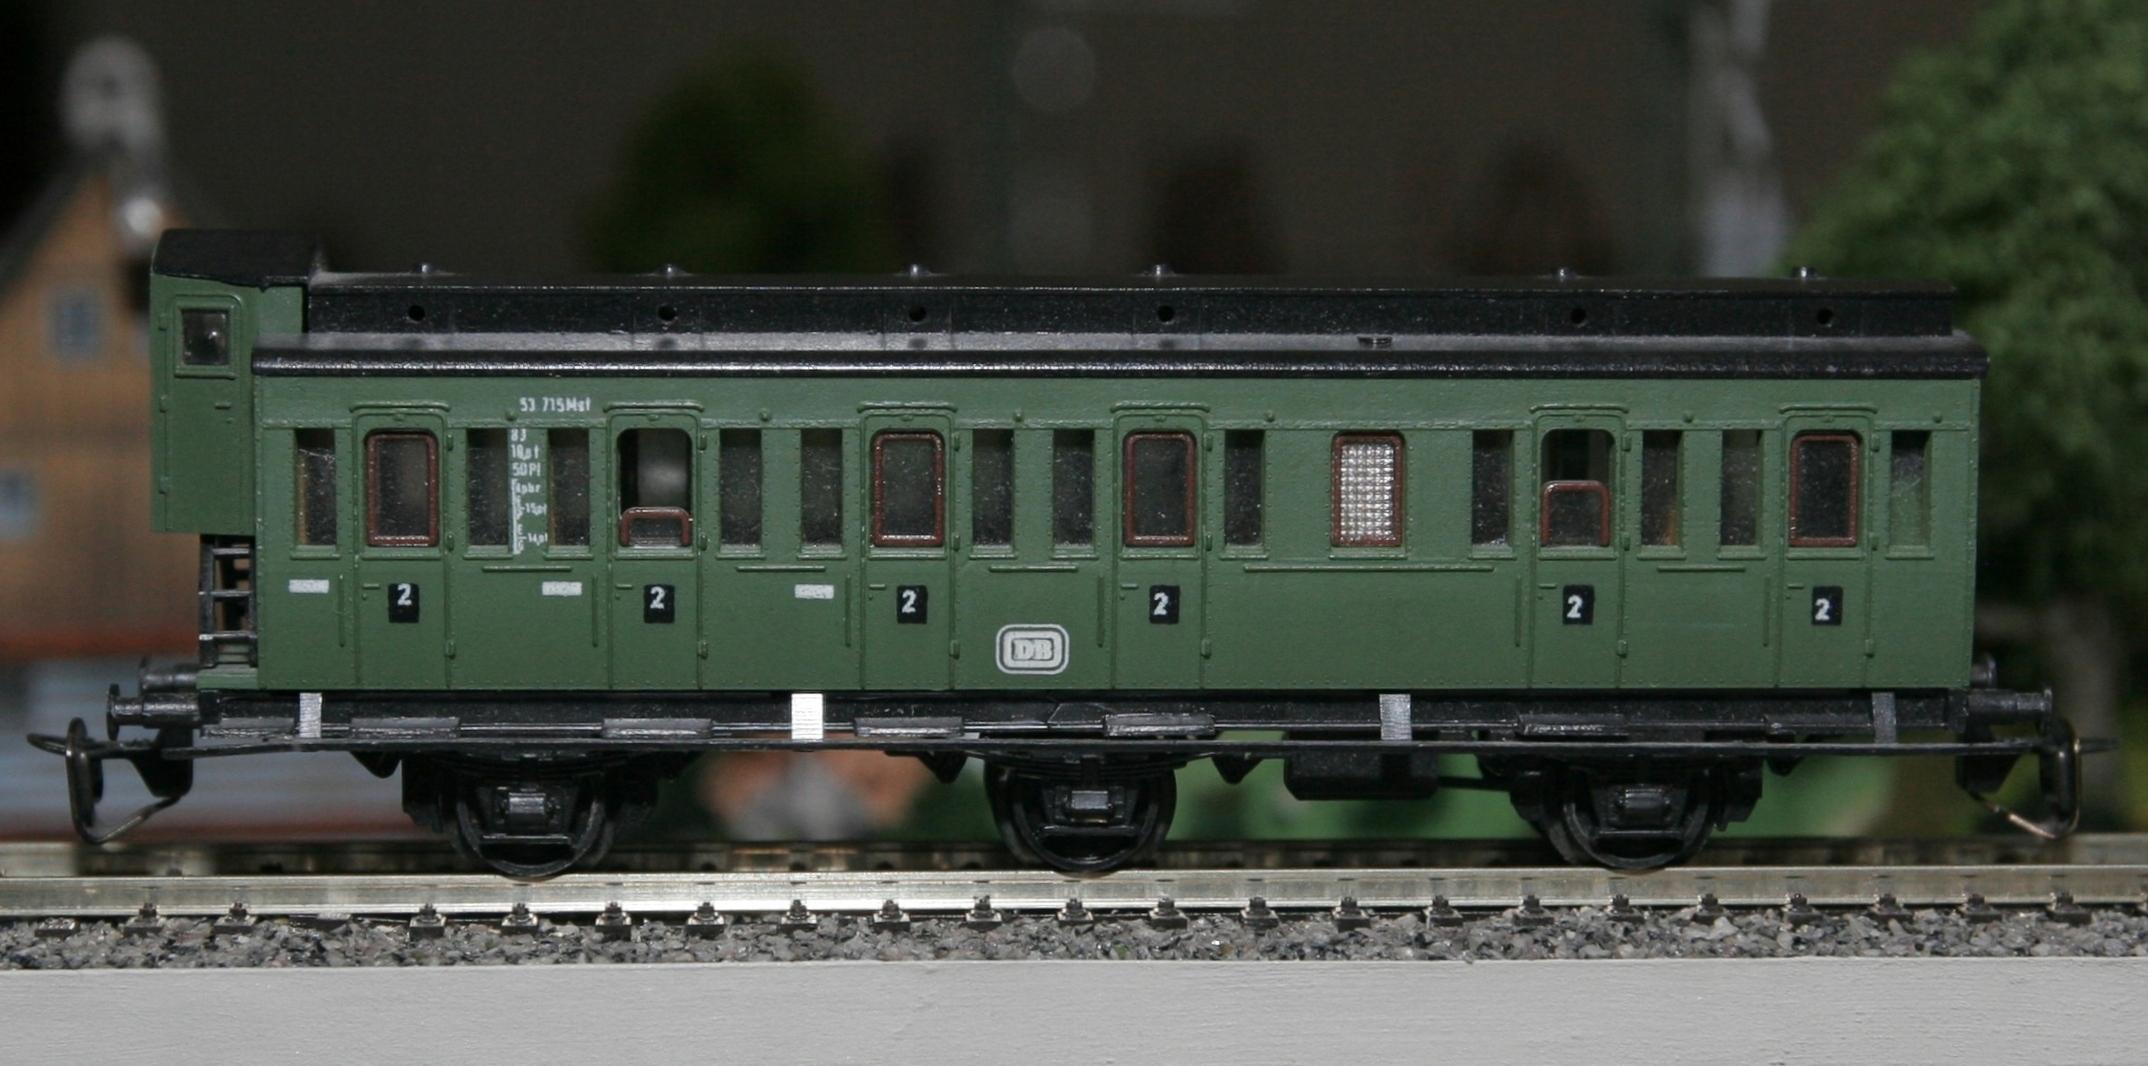 BTTB 3135 II DB ex C3 pr11, 2 kl., Ep.III